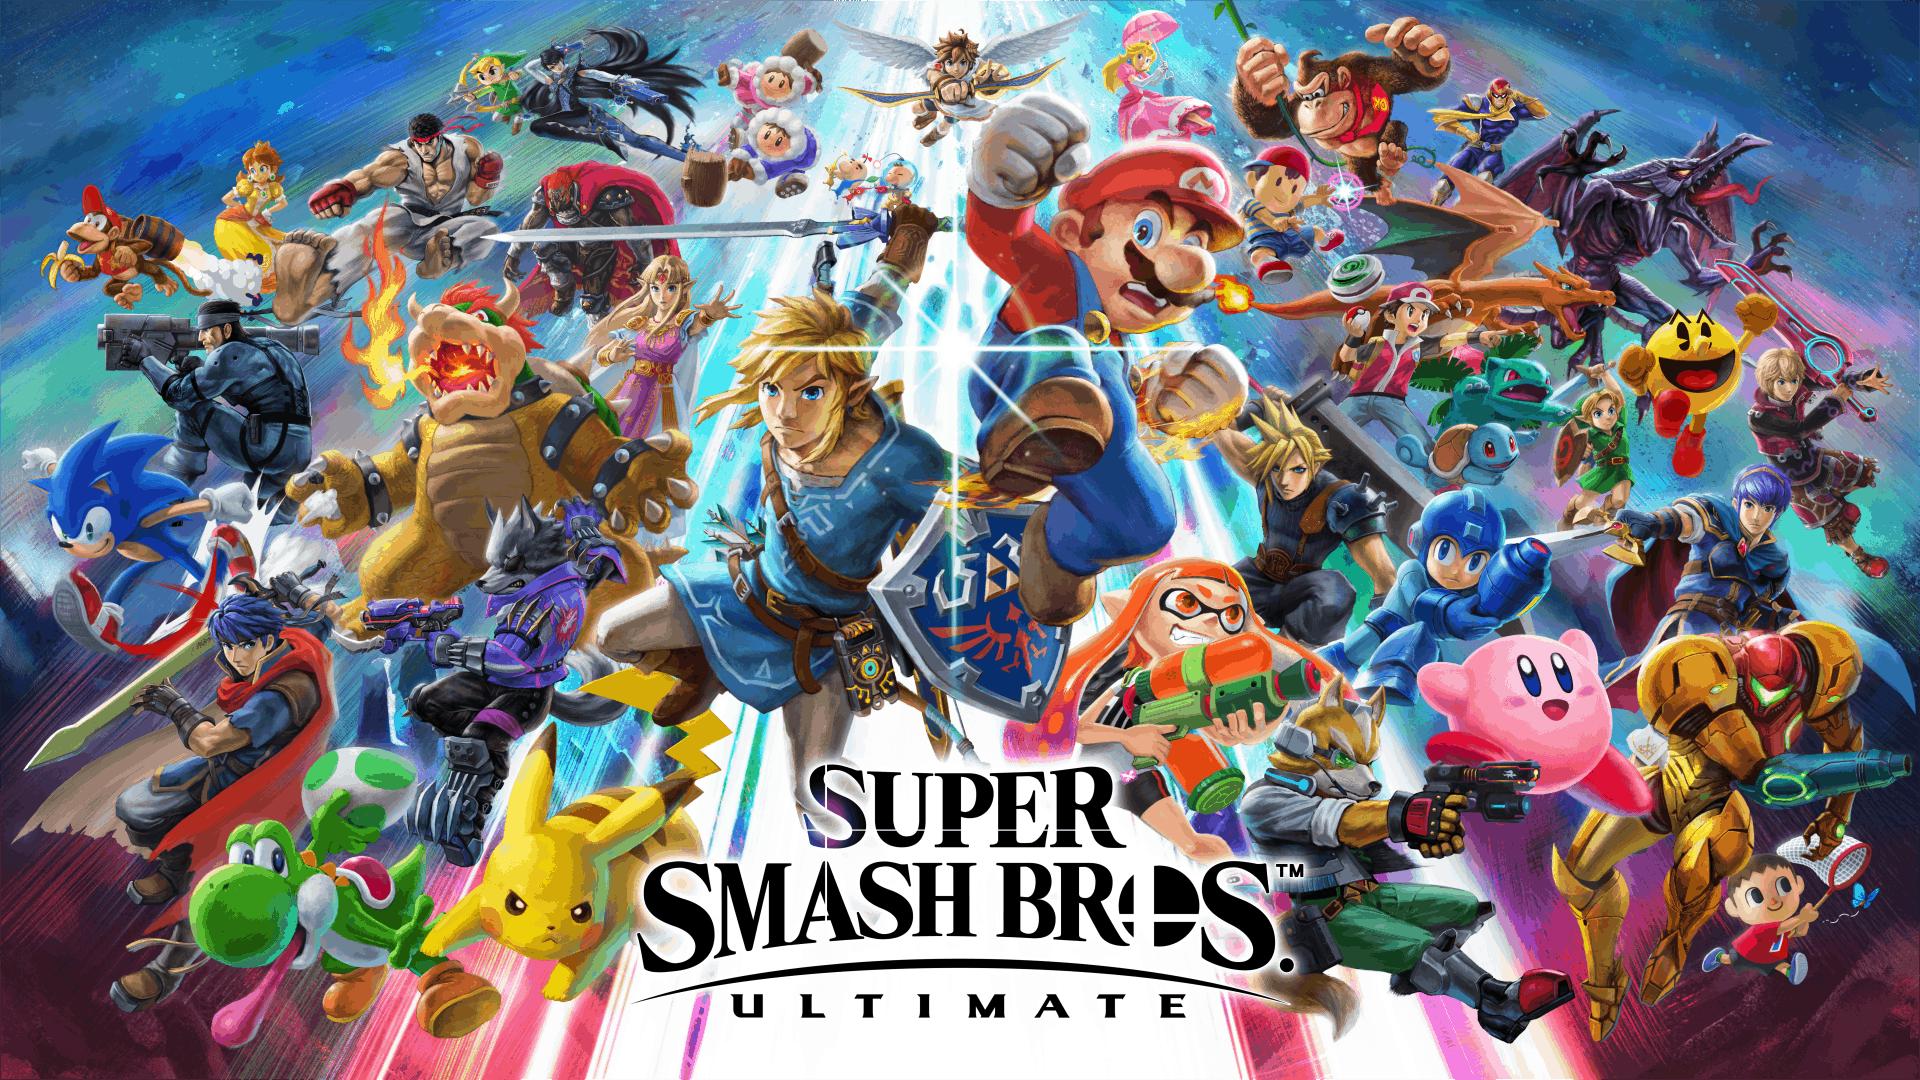 Best Fighting Games - Super Smash Bros- Ultimate